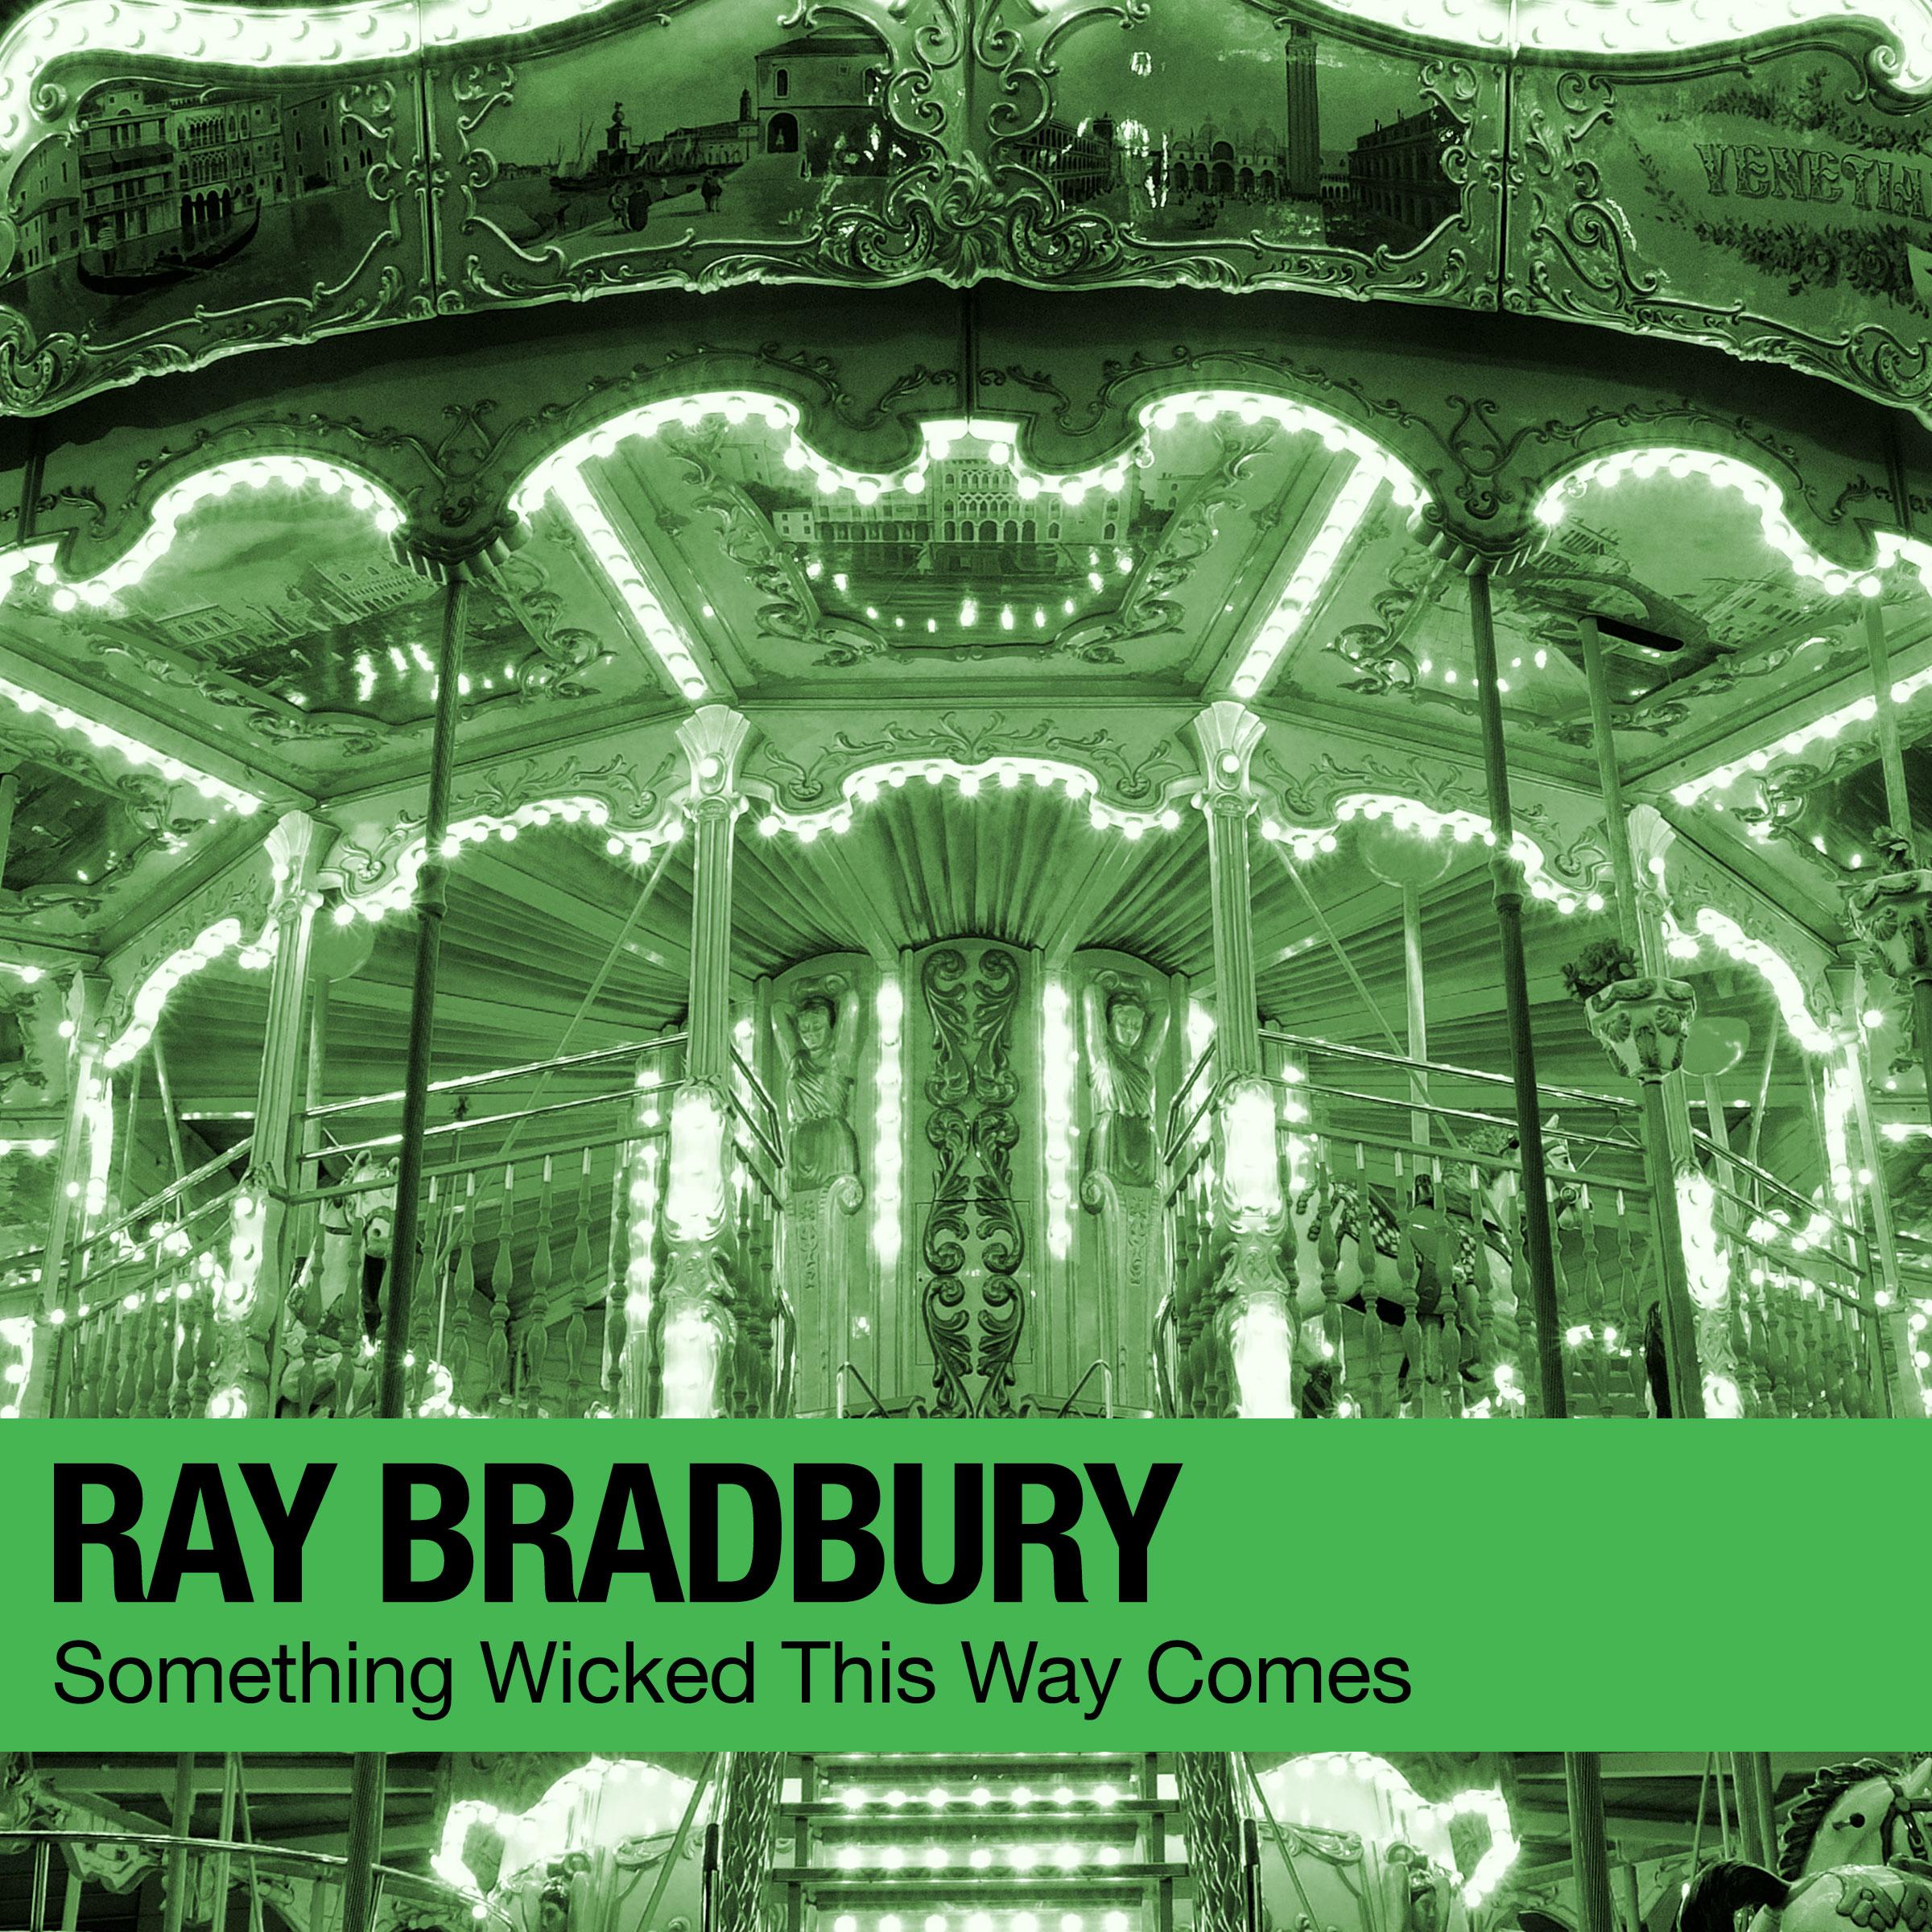 ADBLCRE-3712-Create-Covers-Ray-Bradbury-Something-Wicked-This-Way-Comes-v5.jpg